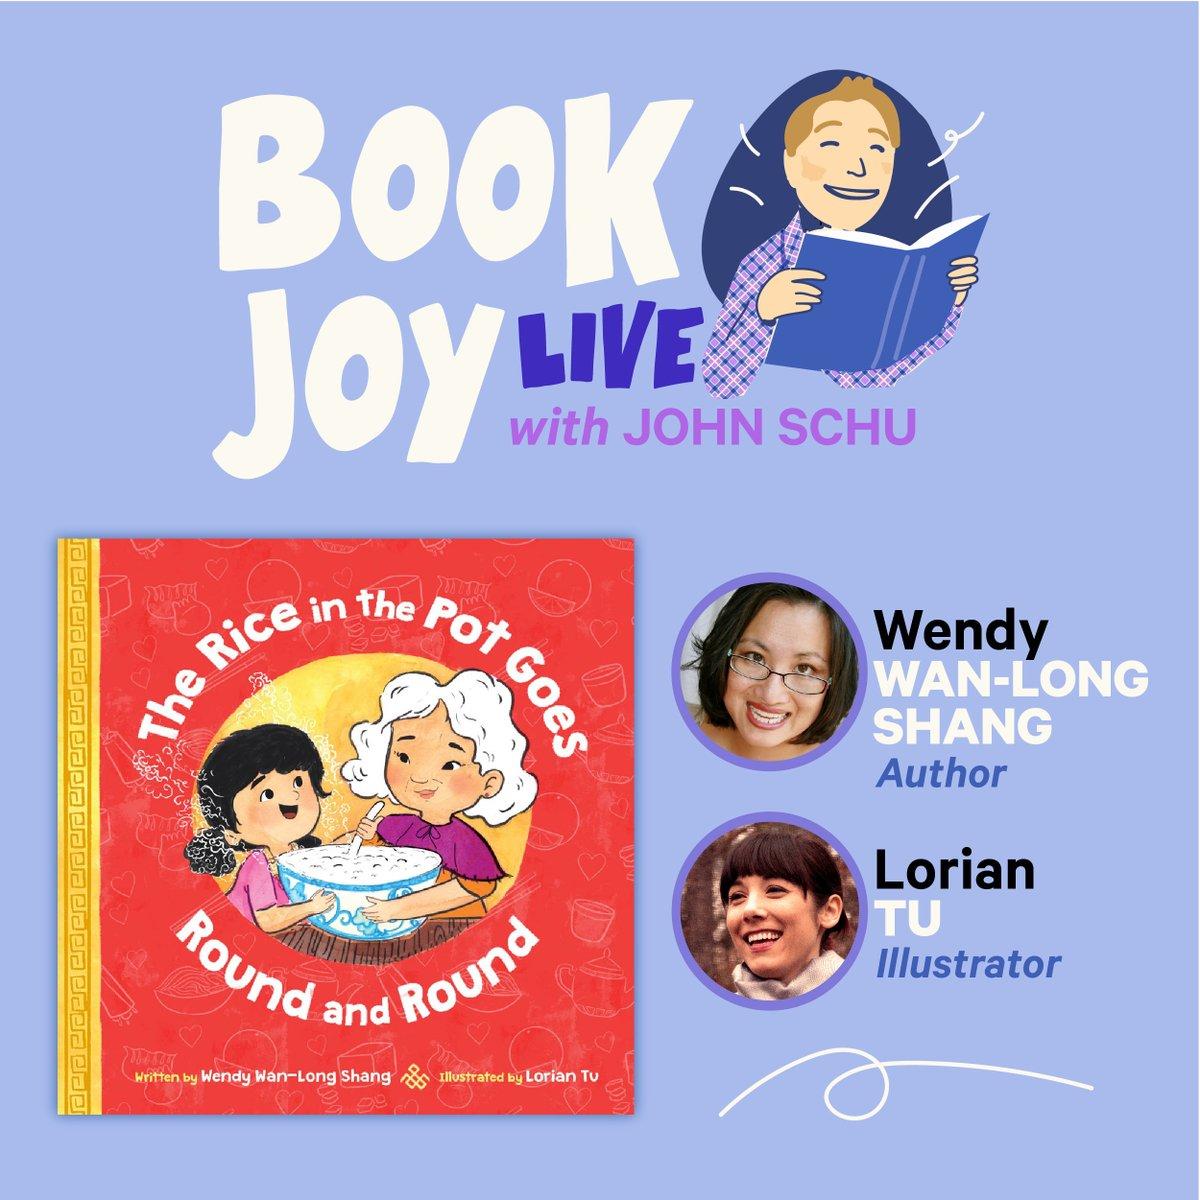 Book Joy Live with @WendyShang and @LorianTuBooks is on Thursday at 4:00 PM EST: mrschureads.blogspot.com/2021/01/book-j…